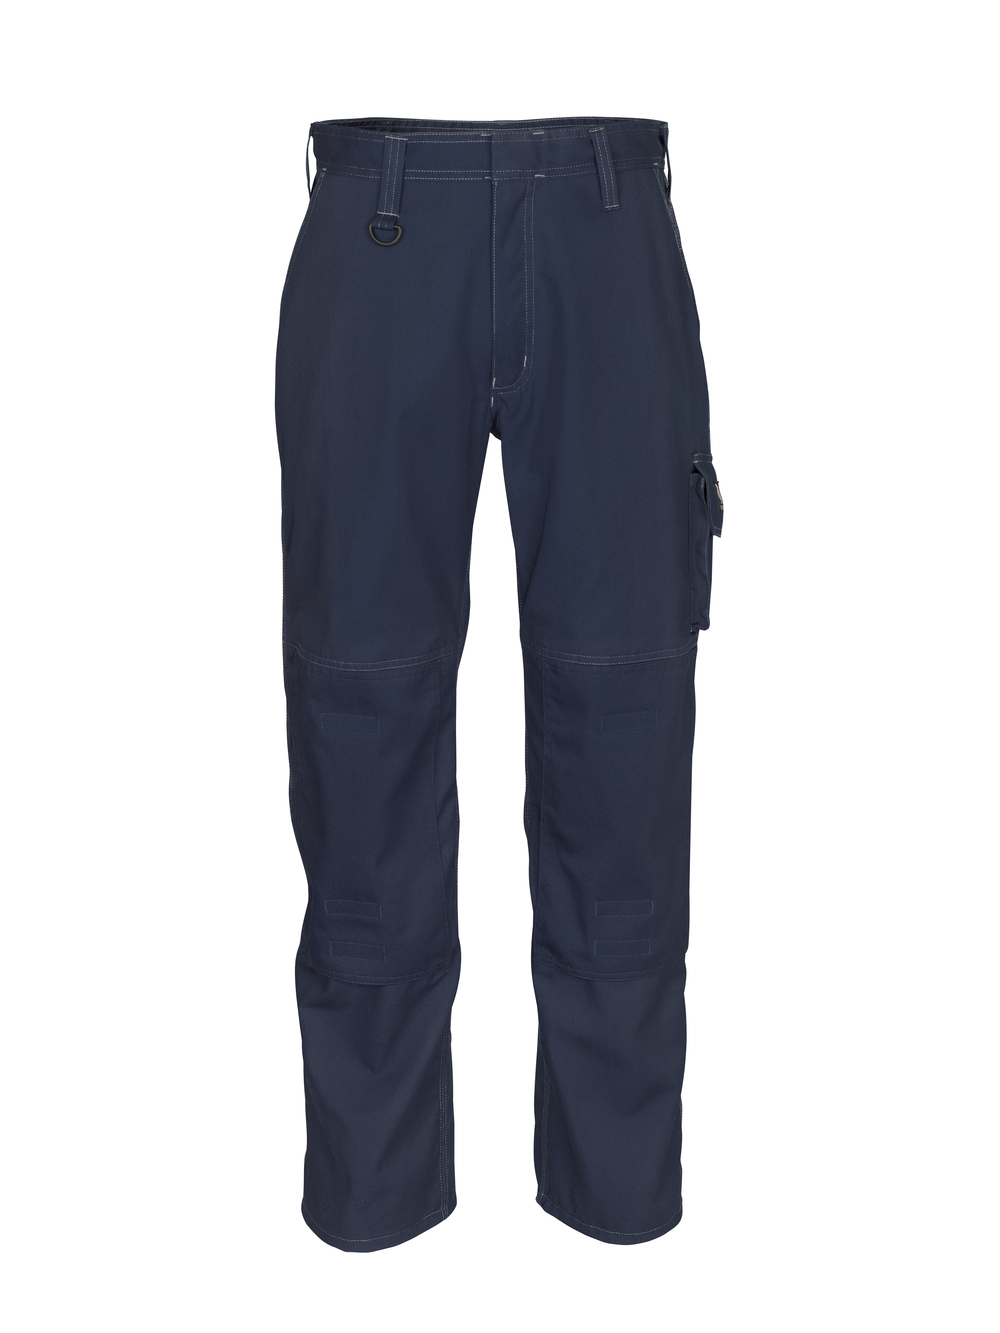 12355-630-010 Spodnie z kieszeniami na kolanach - ciemny granat